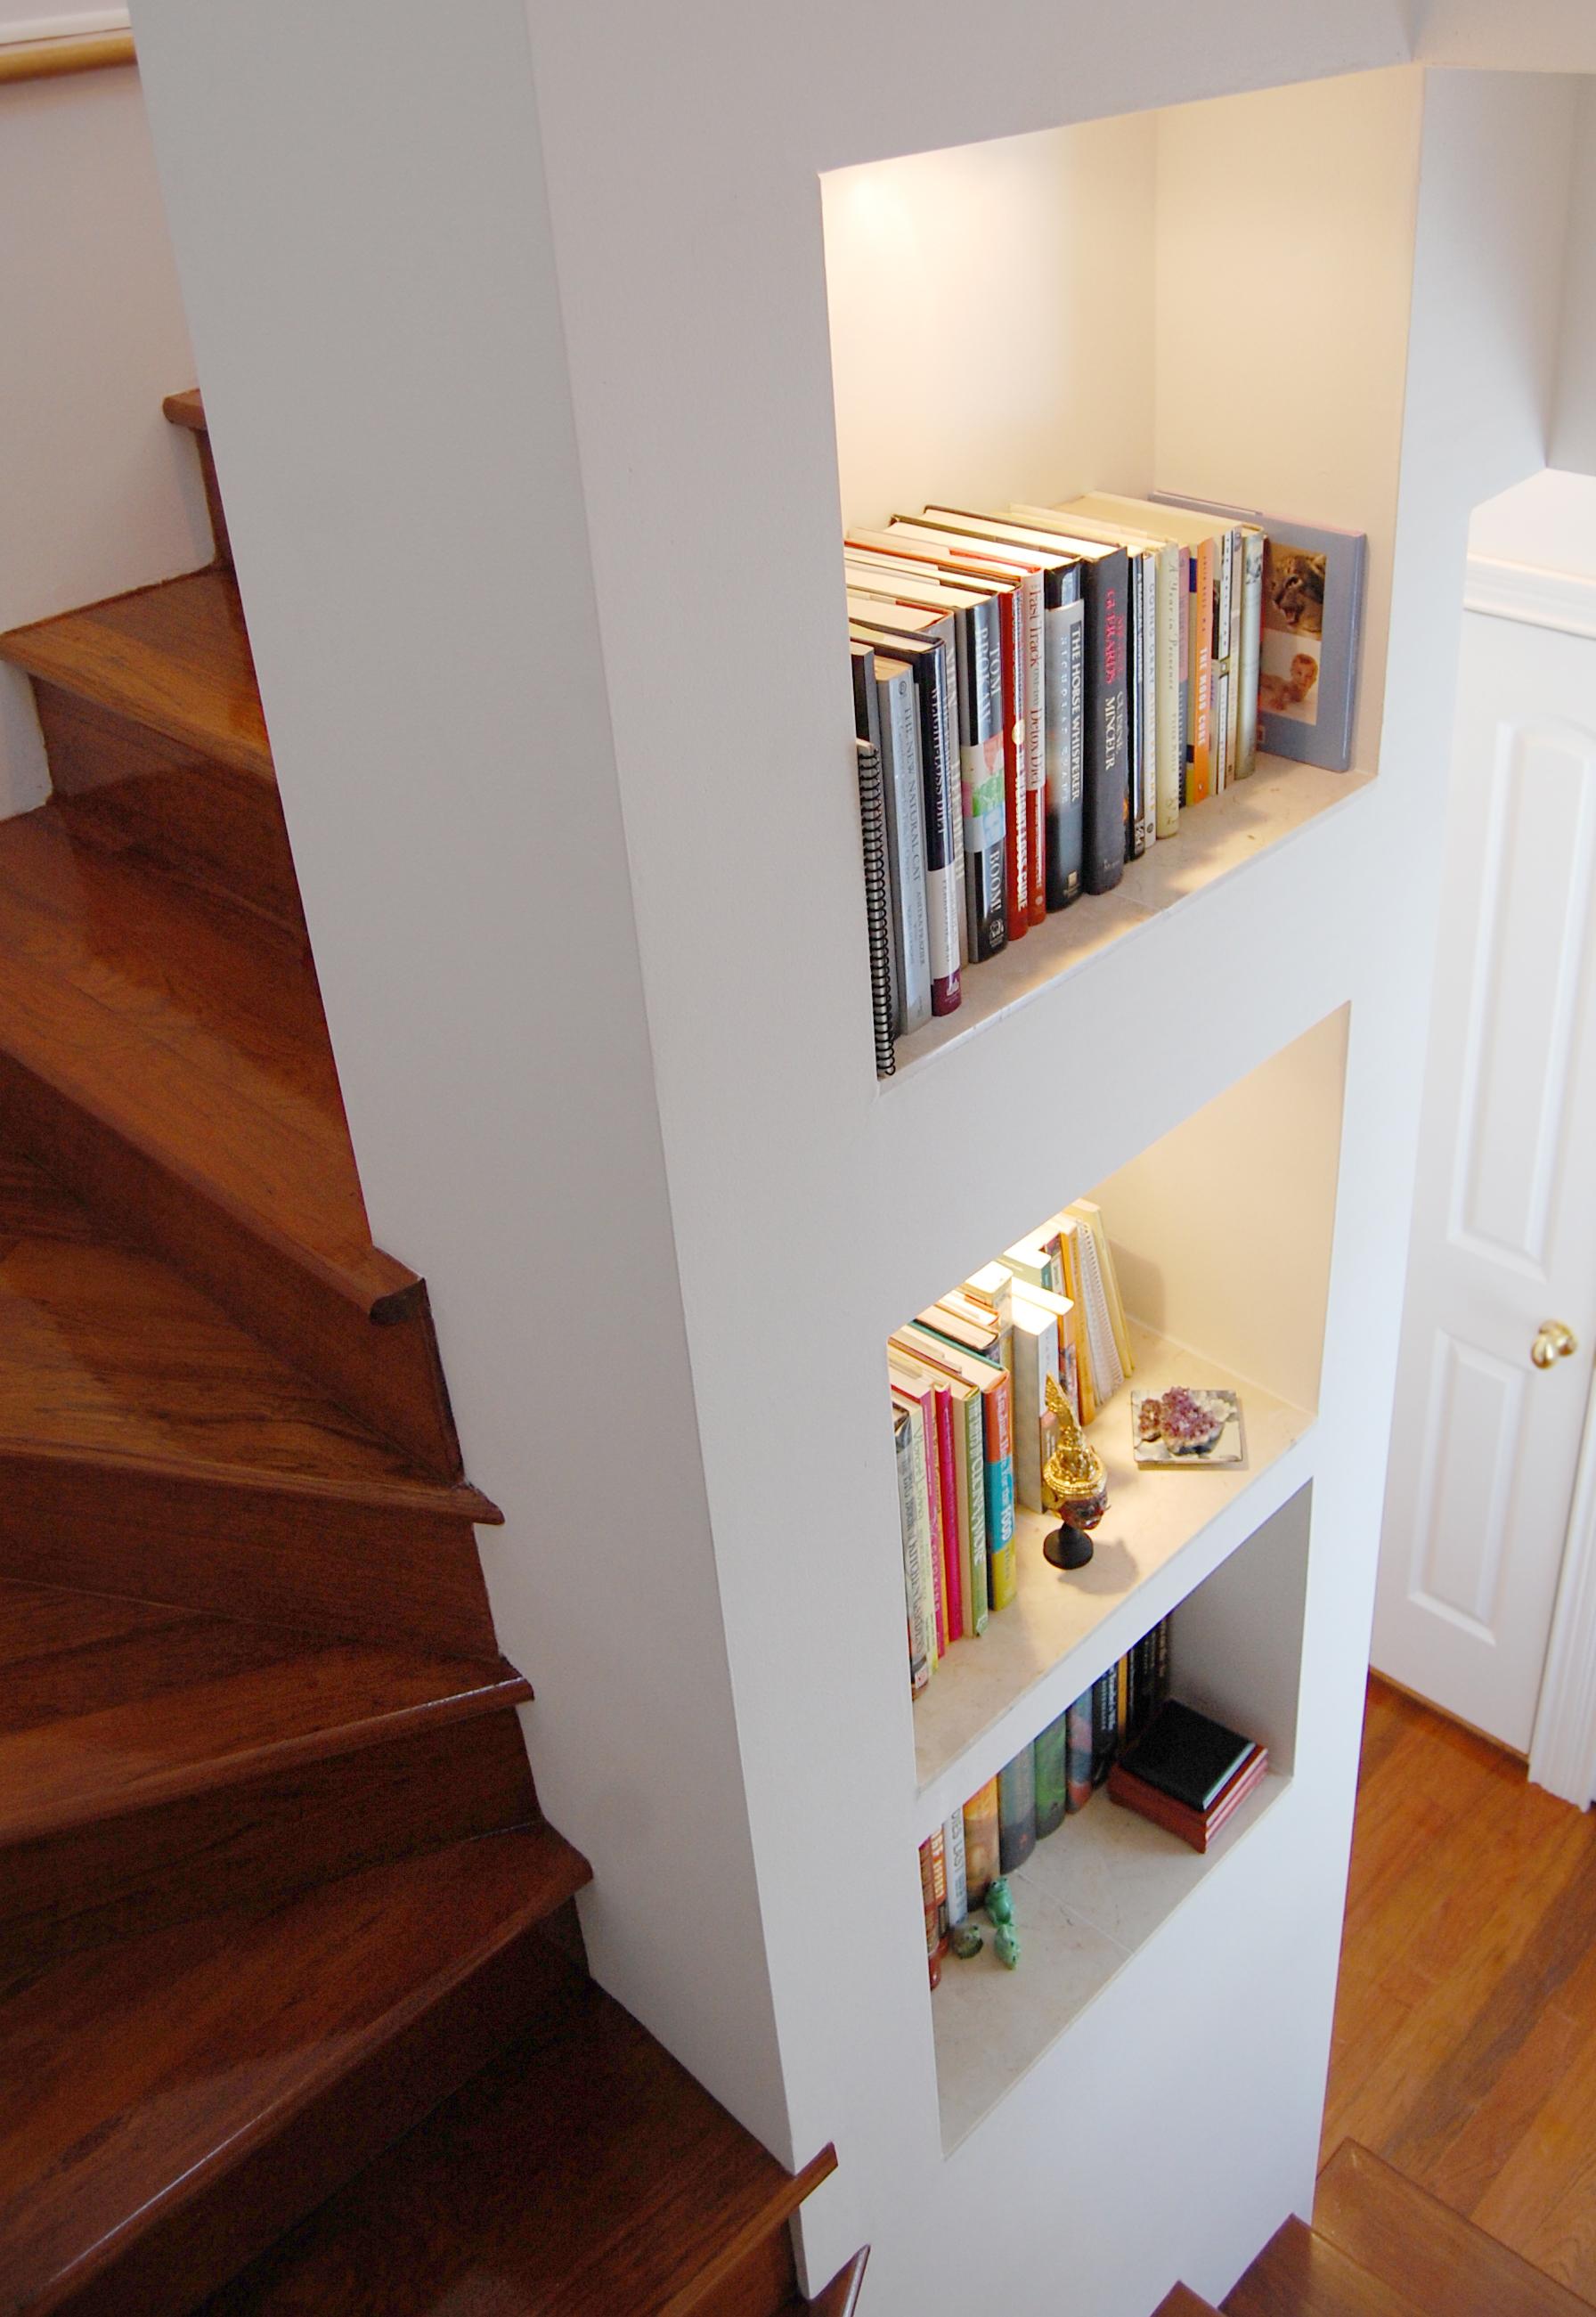 custom gut renovation single-family late-ninteenth-century coach house residential home, interior, skylight, stairs, built-in shelves, hardwood floors